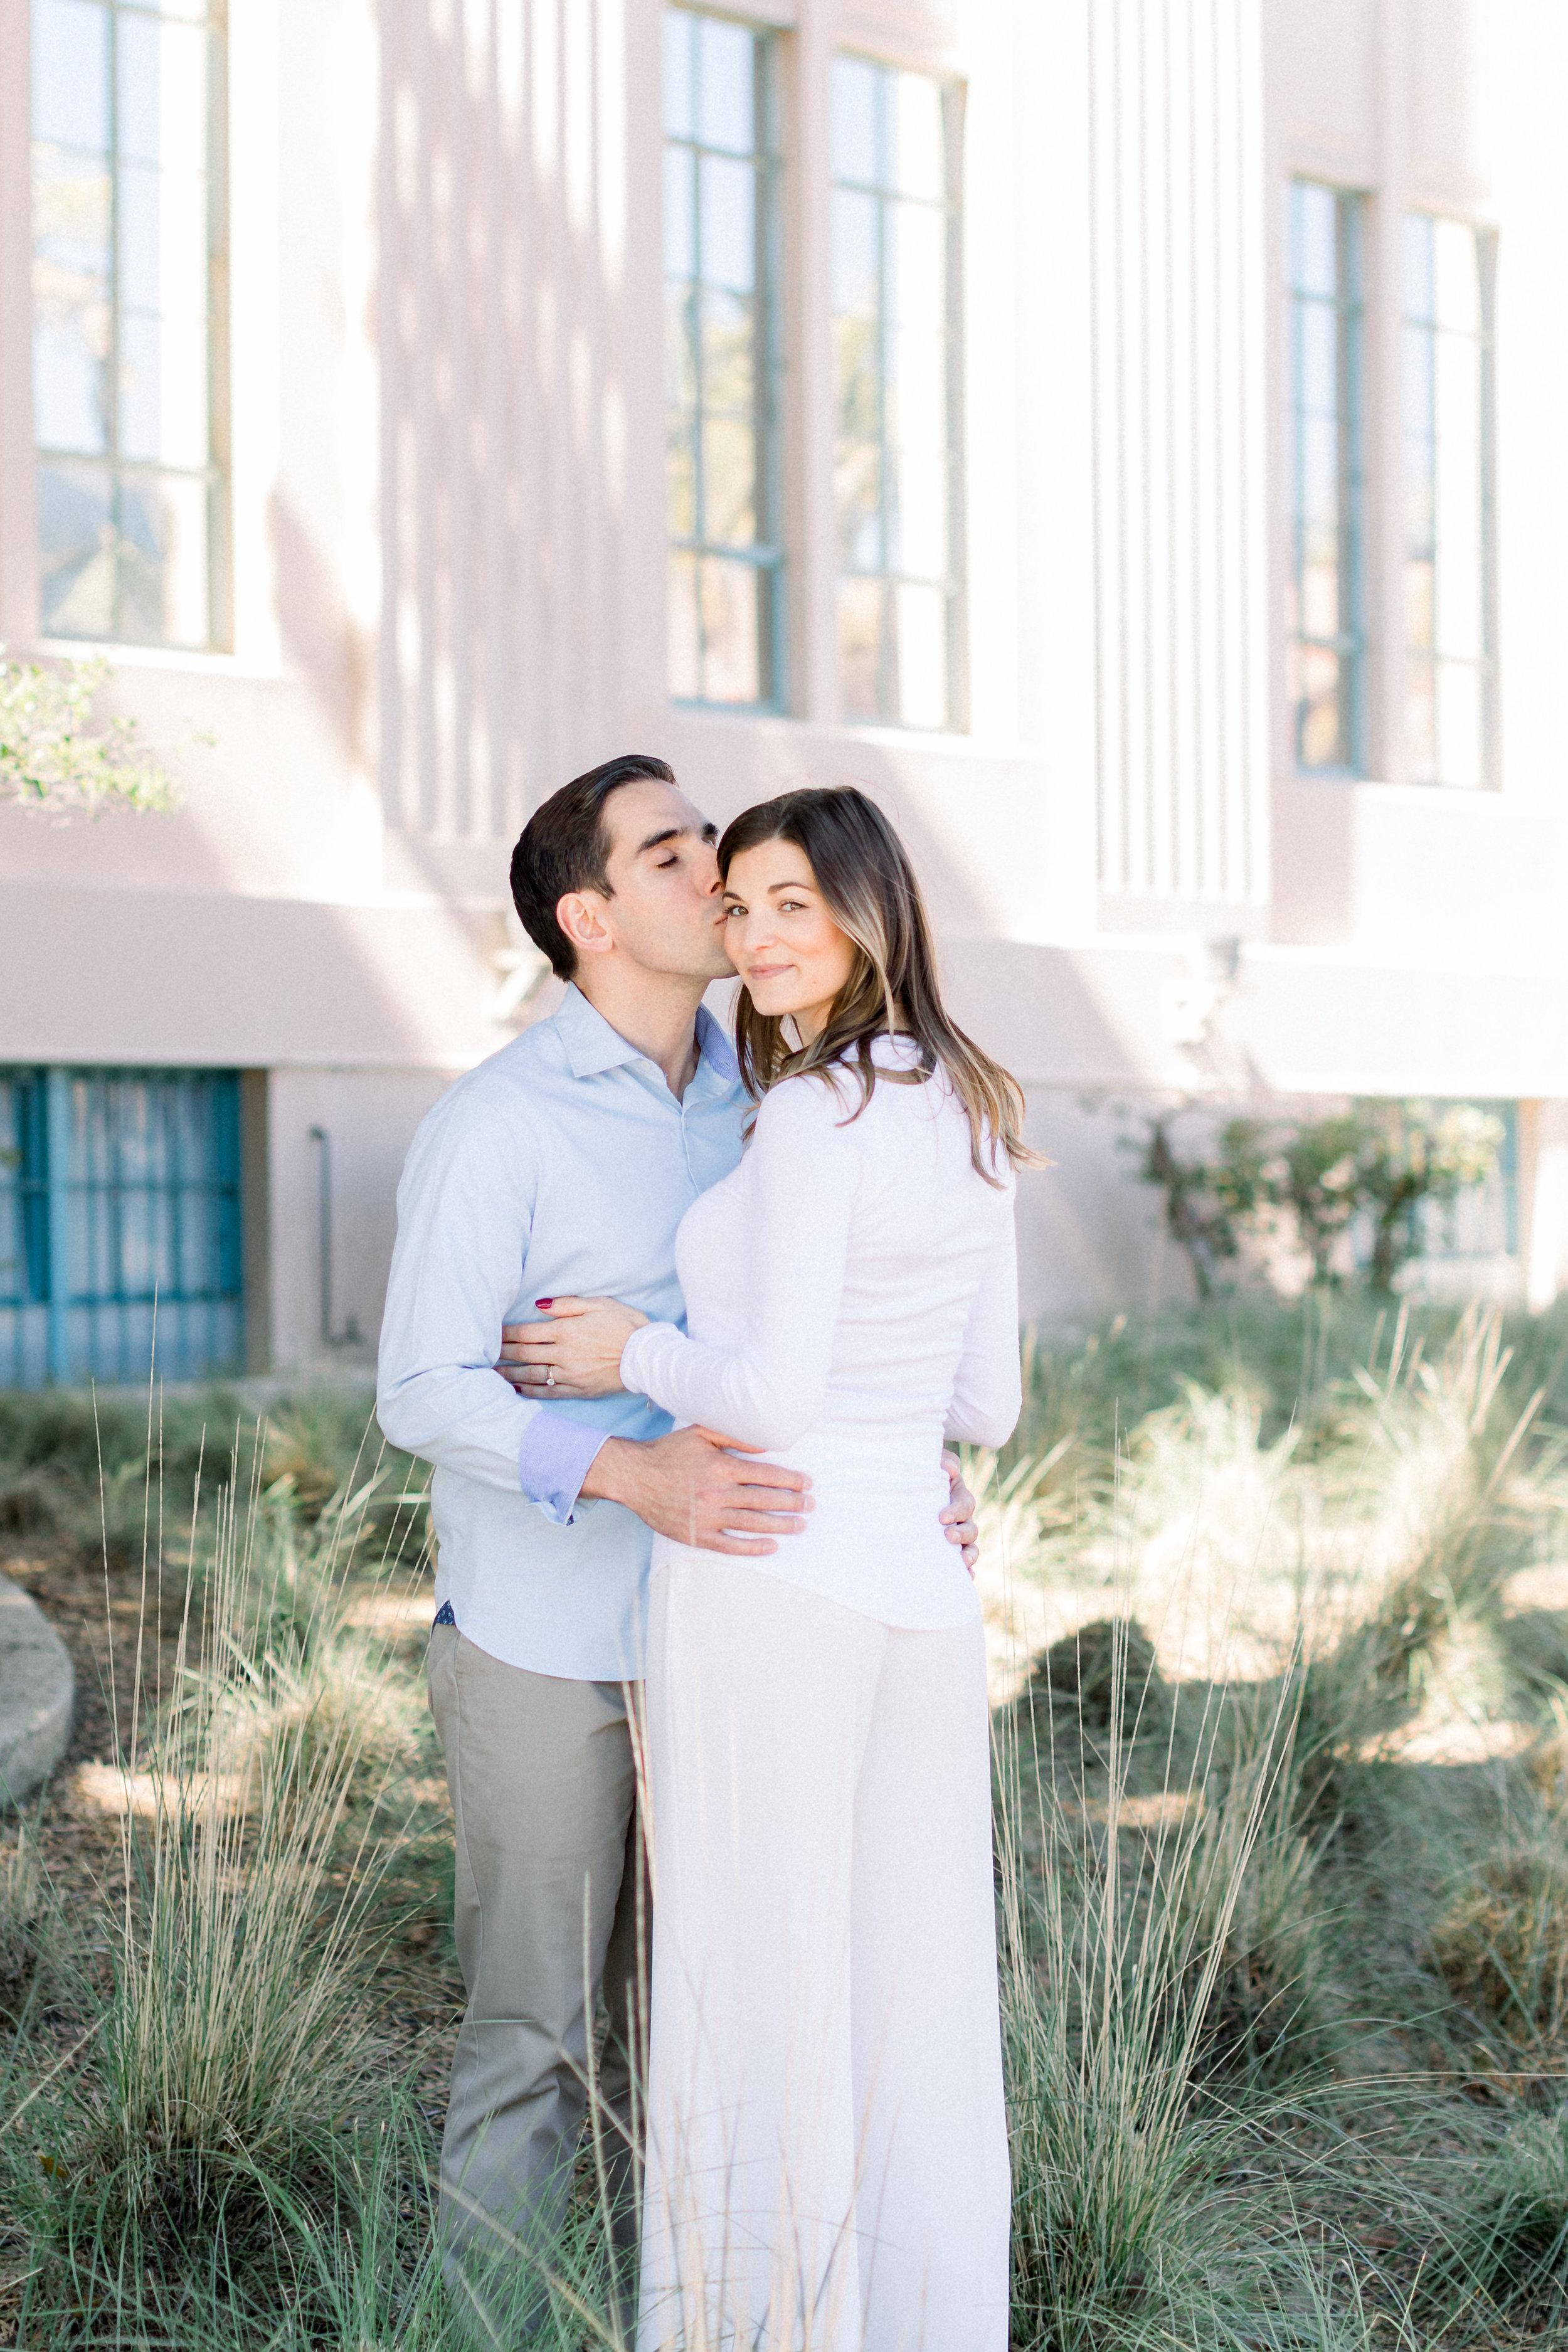 Claire_and_Dan_San_Diego_Administration_Building_Elopement_Alyssa_Boynton_Photography-27.jpg